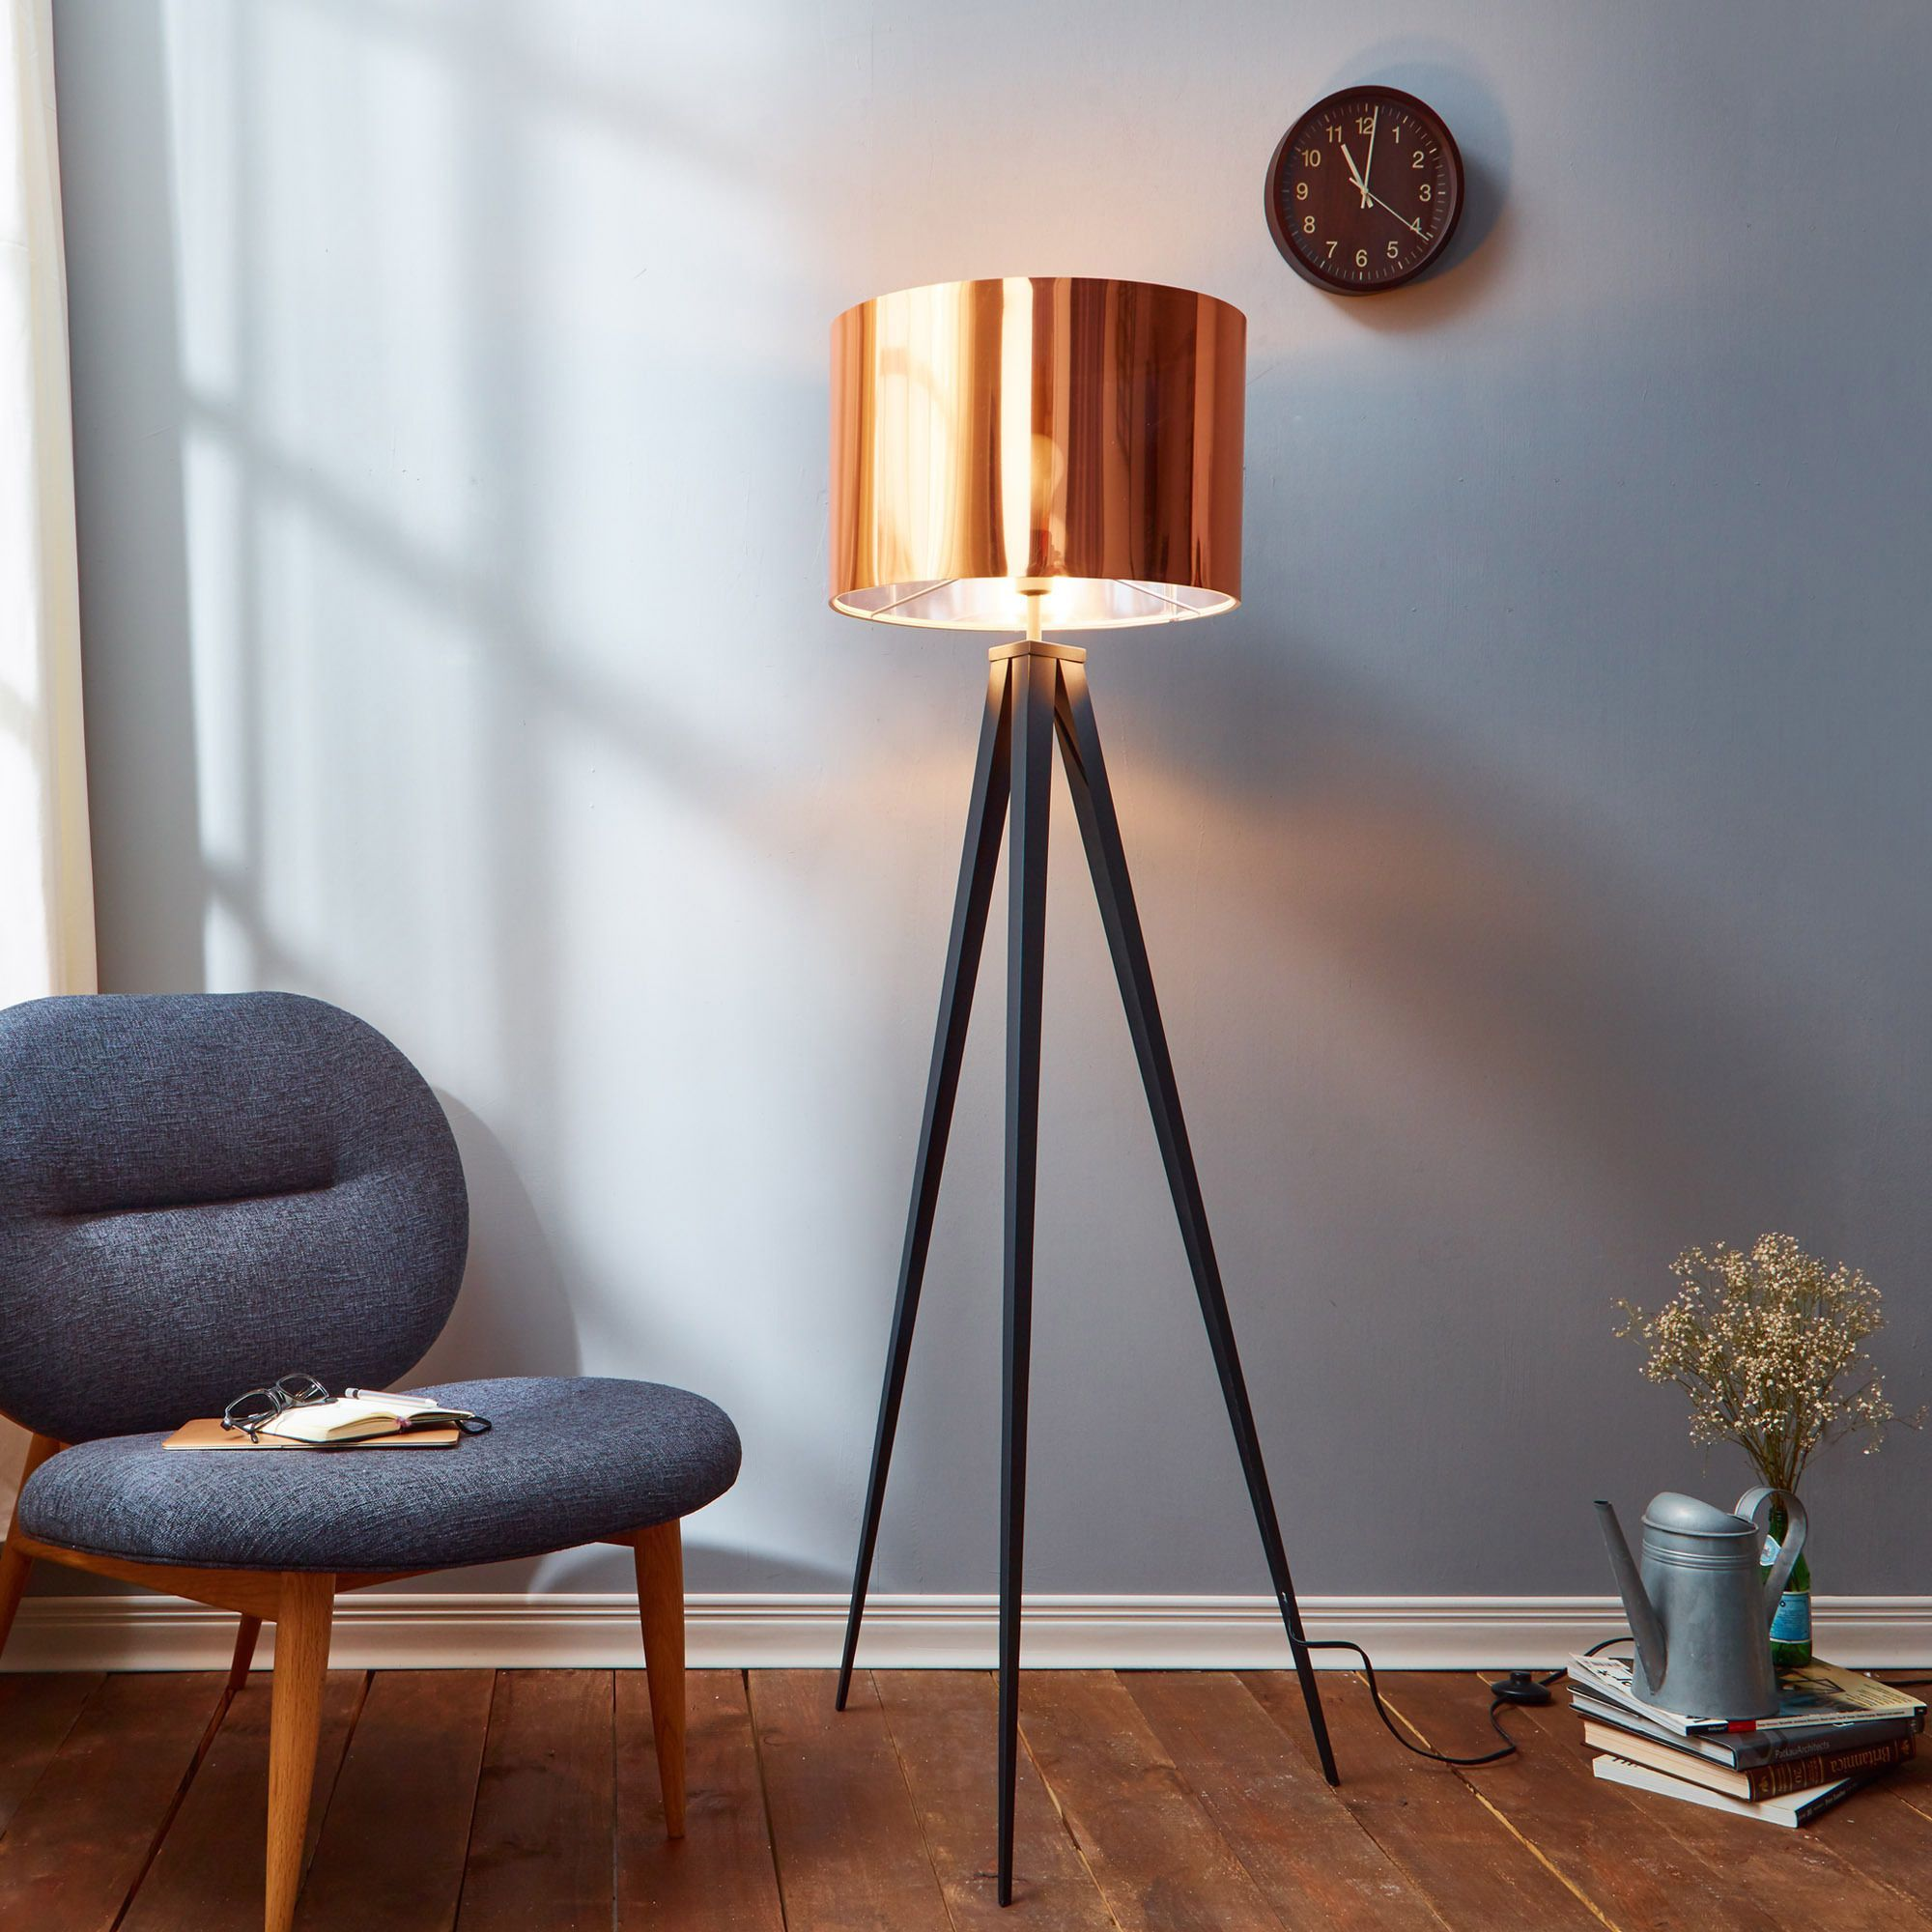 Threshold torchiere floor lamp textured bronze 65 - Teamson Versanora Romanza Tripod Floor Lamp With Copper Shade Romanza 60 23 Tripod Floor Lamp Copper